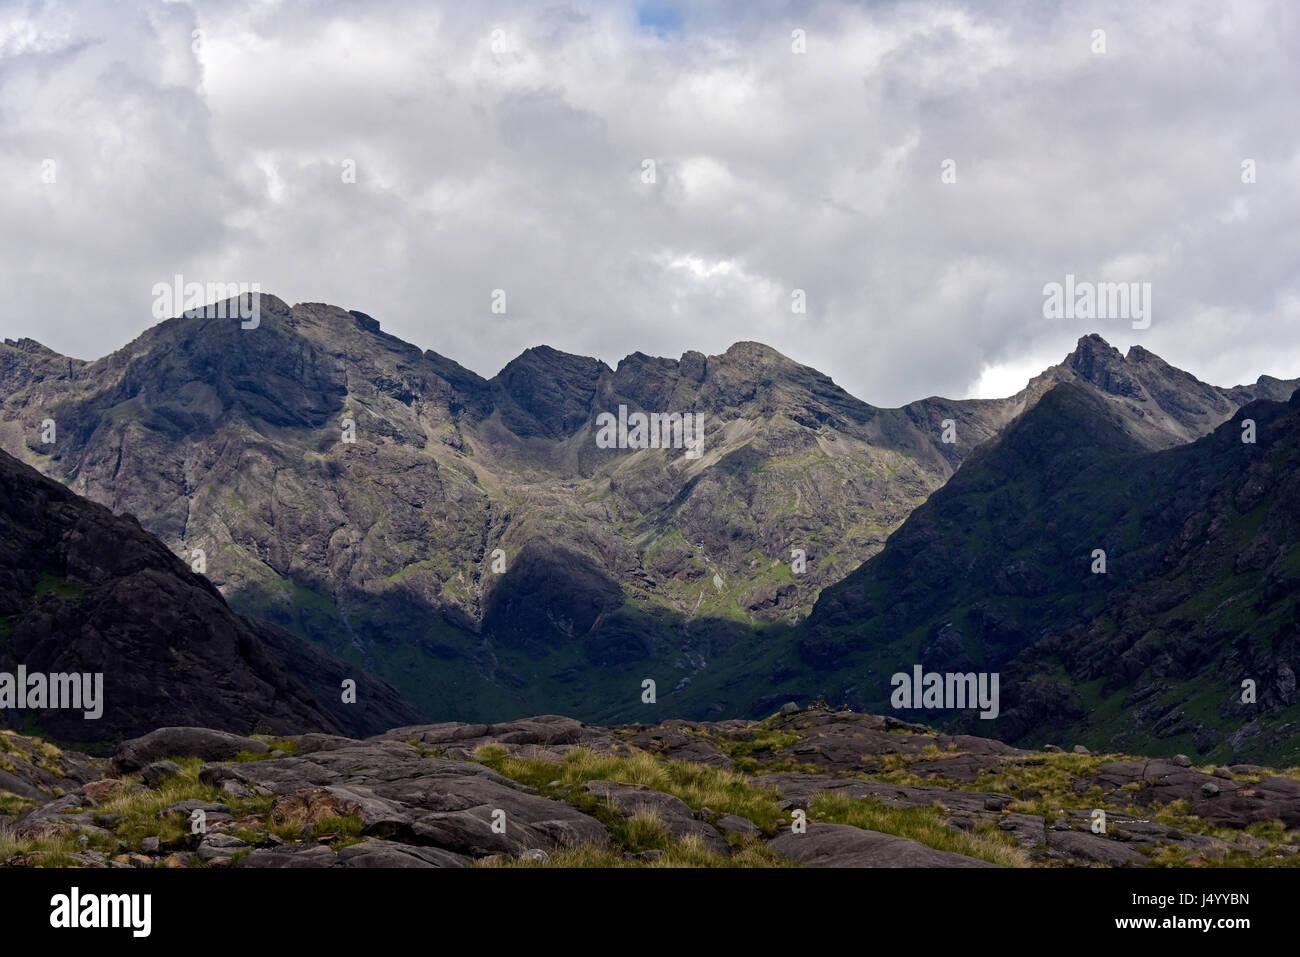 The Black Cuillin viewed from Loch Coruisk. Isle of Skye, Highland, Scotland, United Kingdom, Europe. - Stock Image